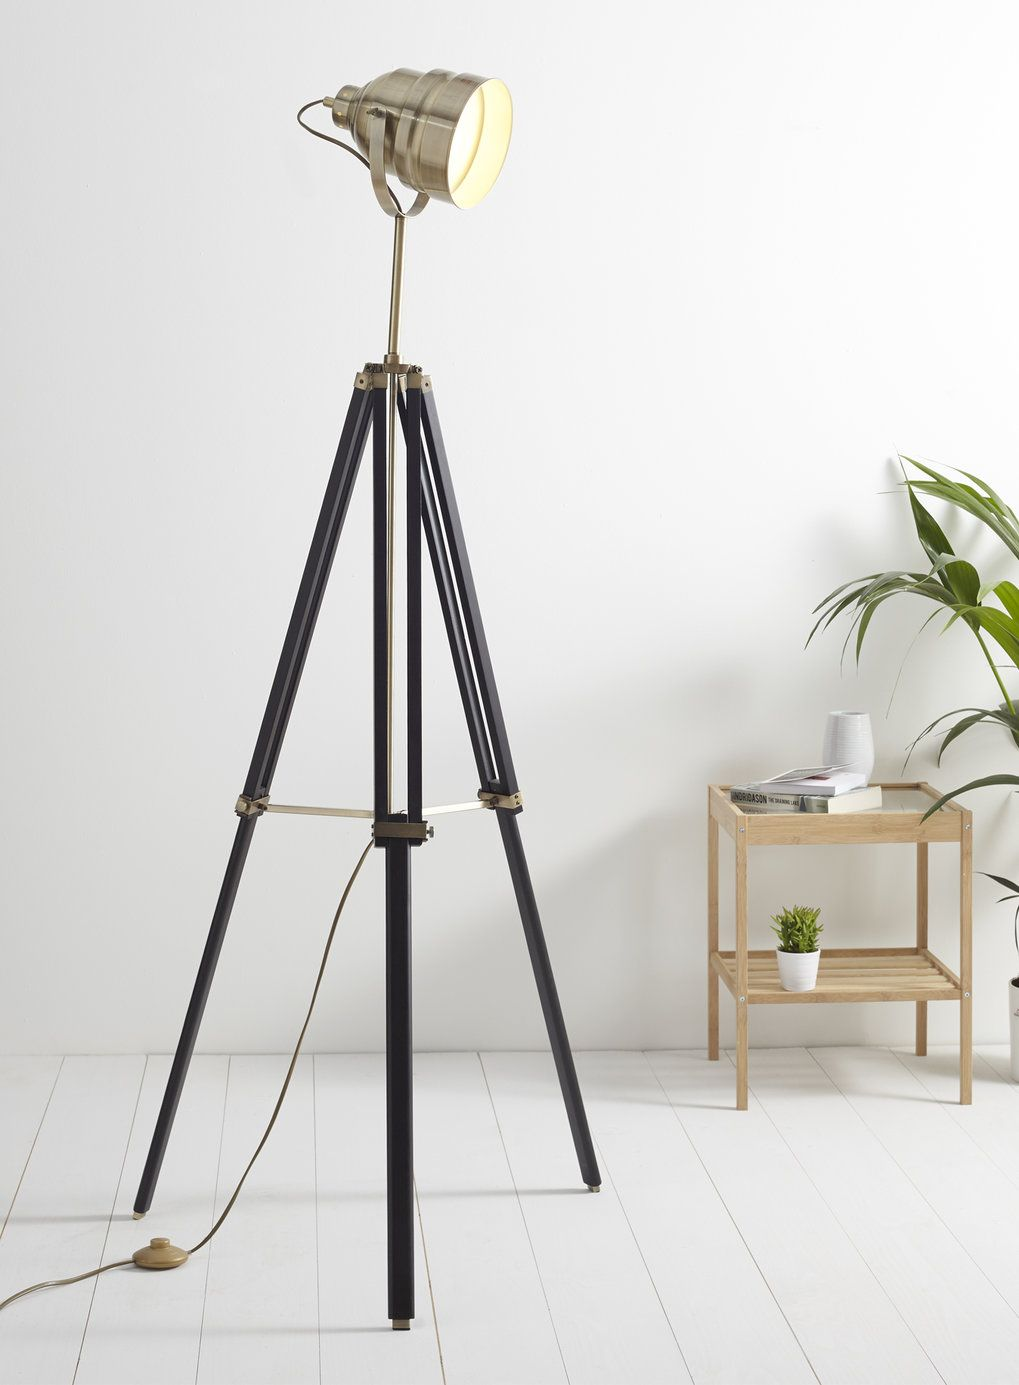 Camera Tripod Floor Lamp BHS 落地灯 Pinterest Code H - Floor lamps on sale